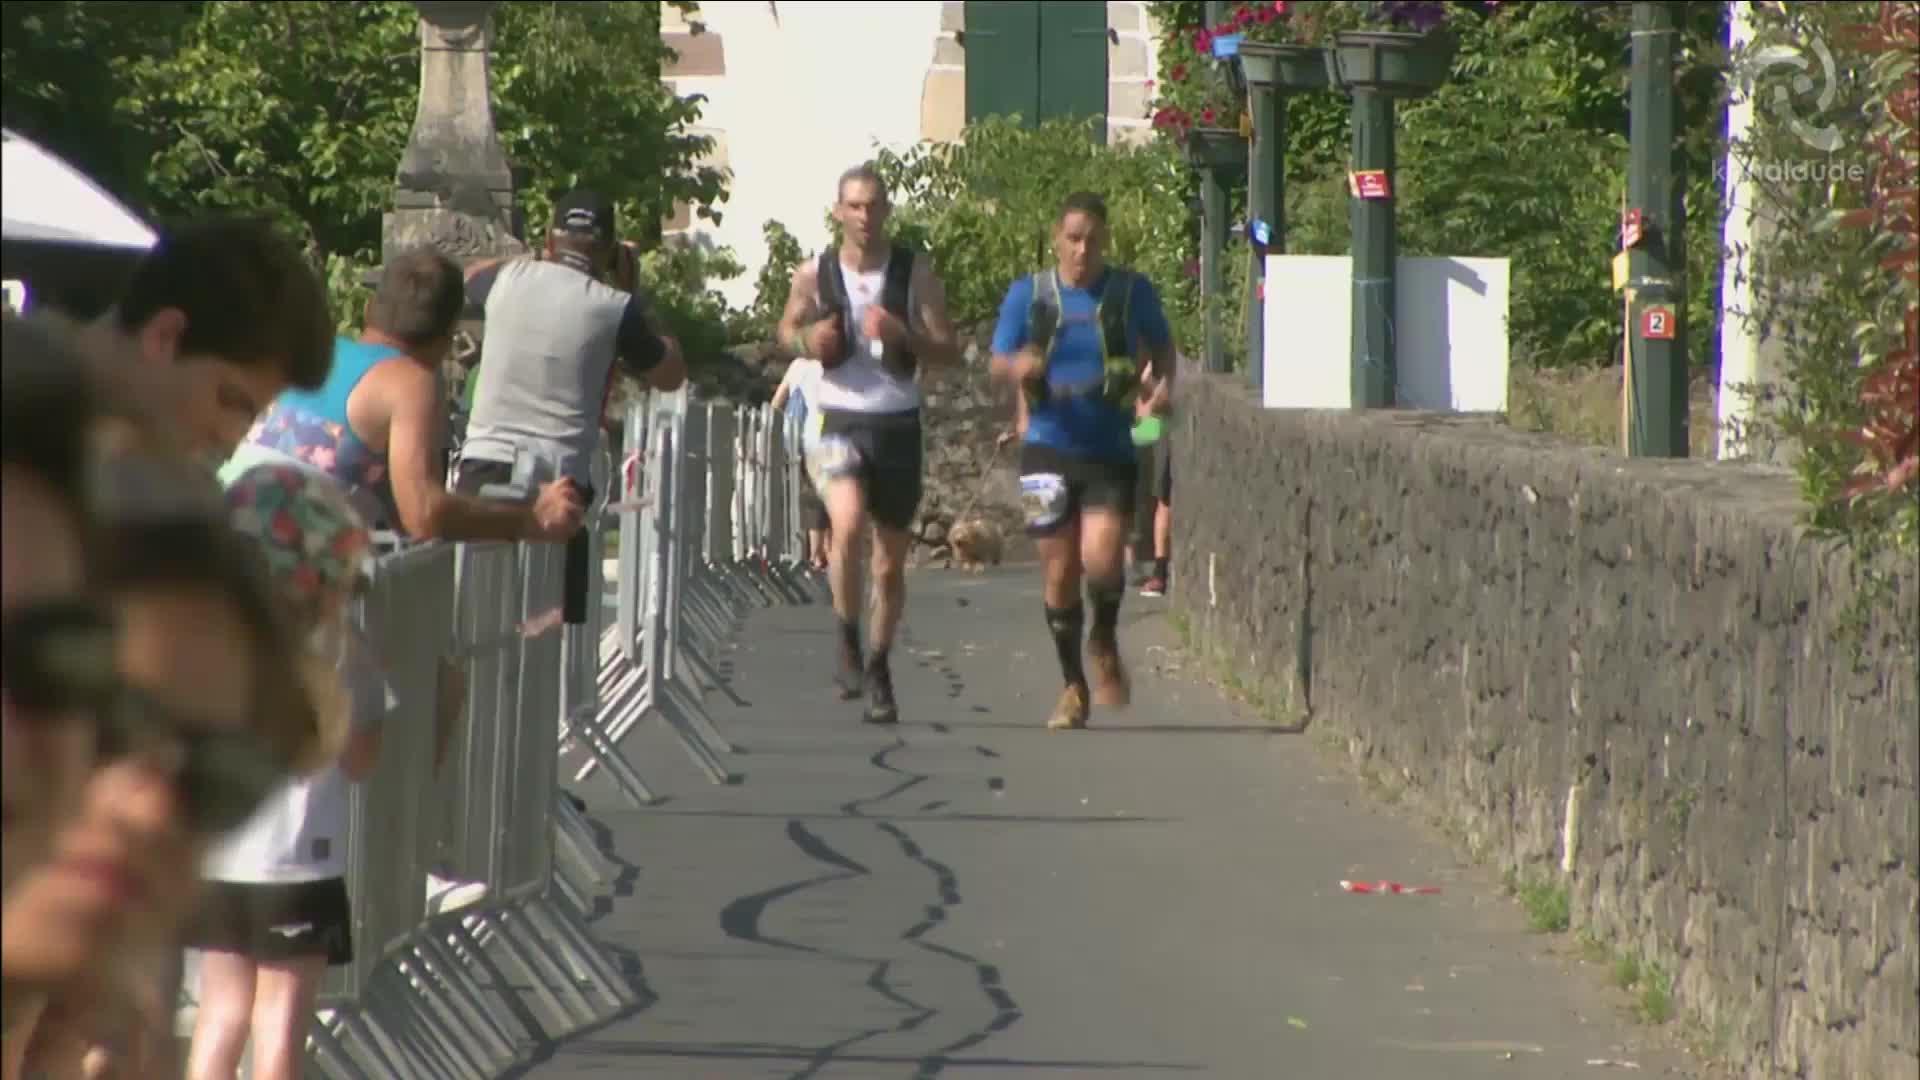 Euskal Trail 2017: Cardein Pioren heltzea